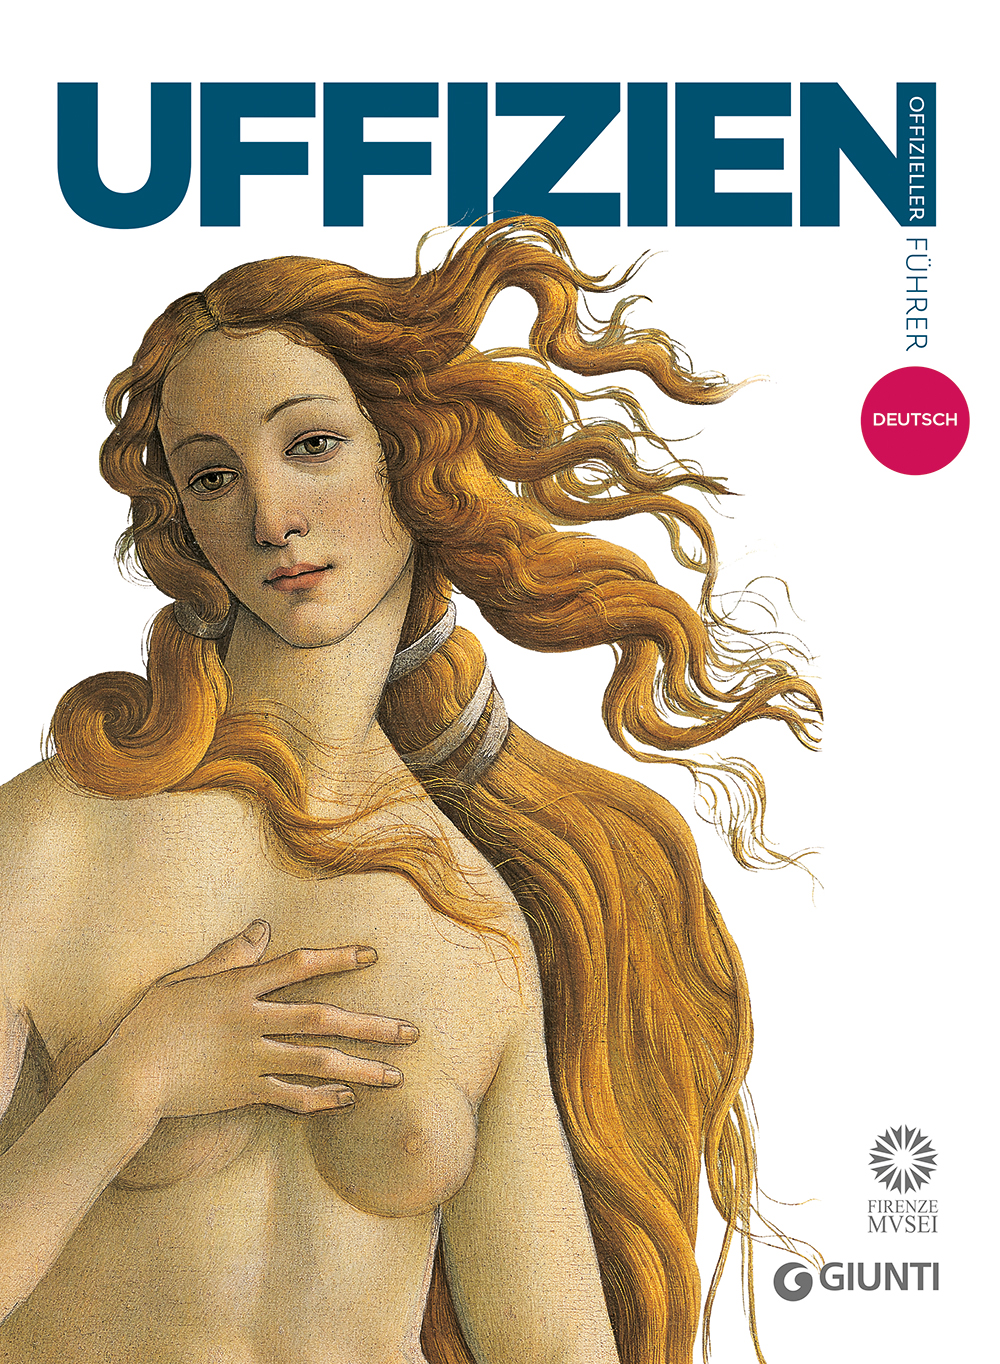 Galerie der Uffizien (in tedesco)